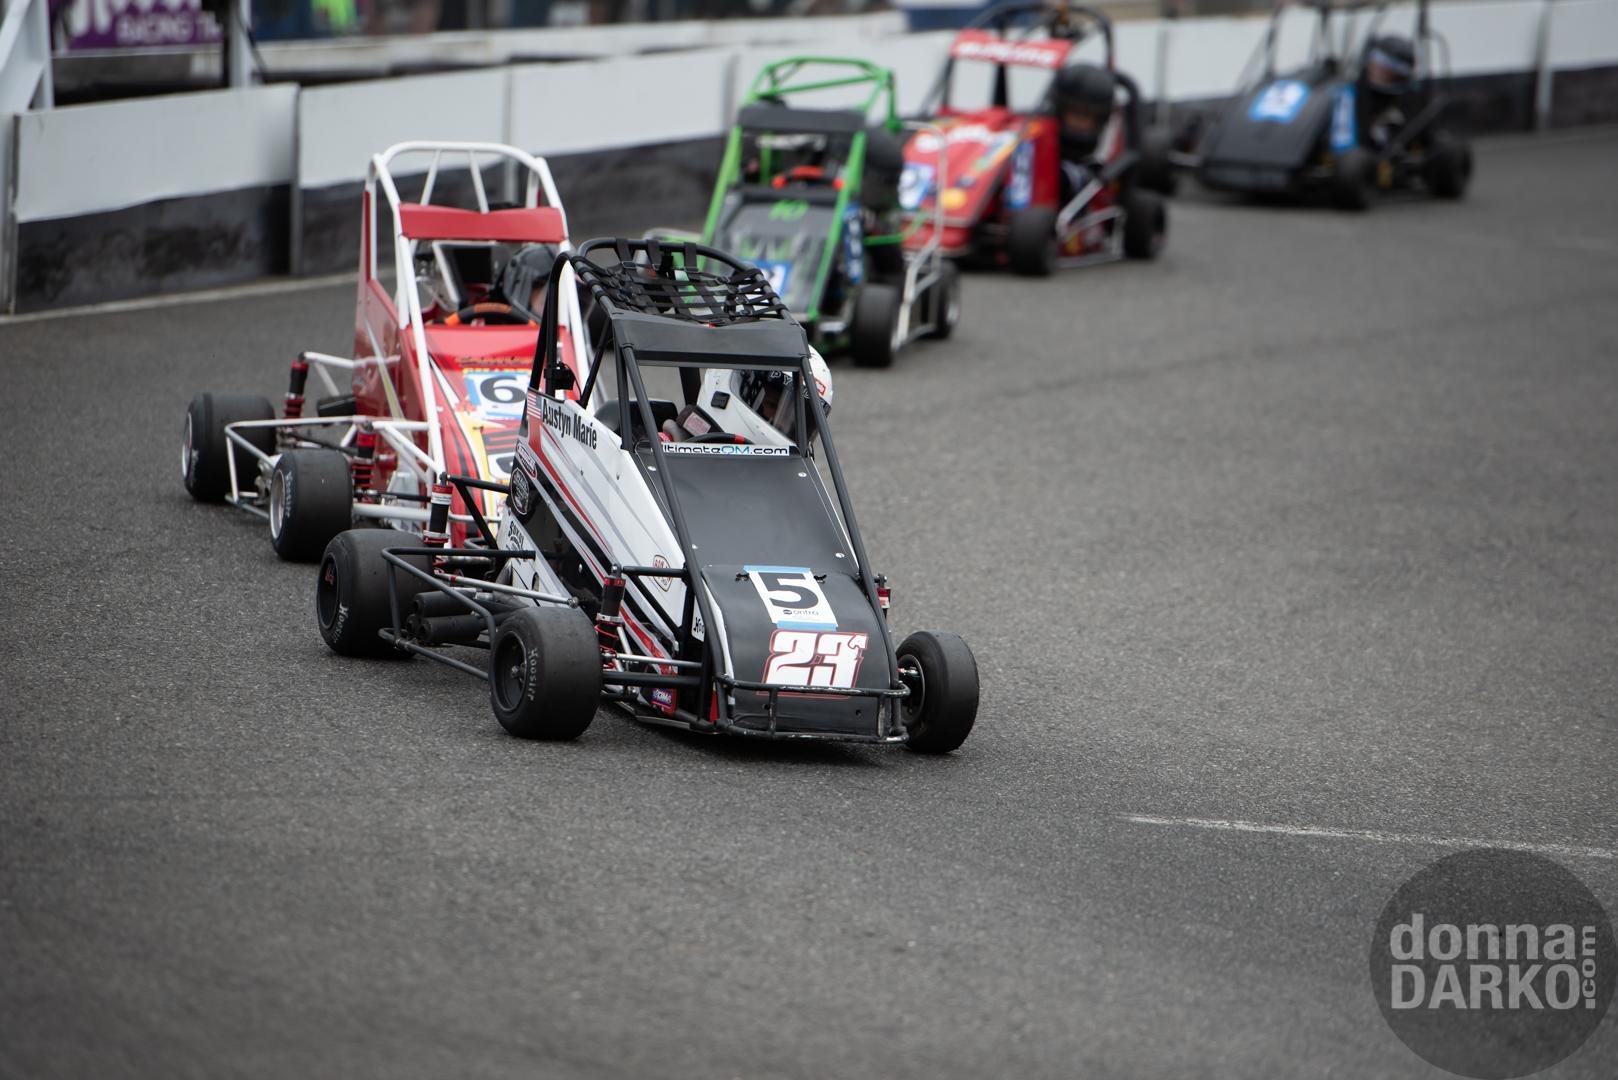 QWMA (Racing) 8-11-2019 DSC_6847.jpg